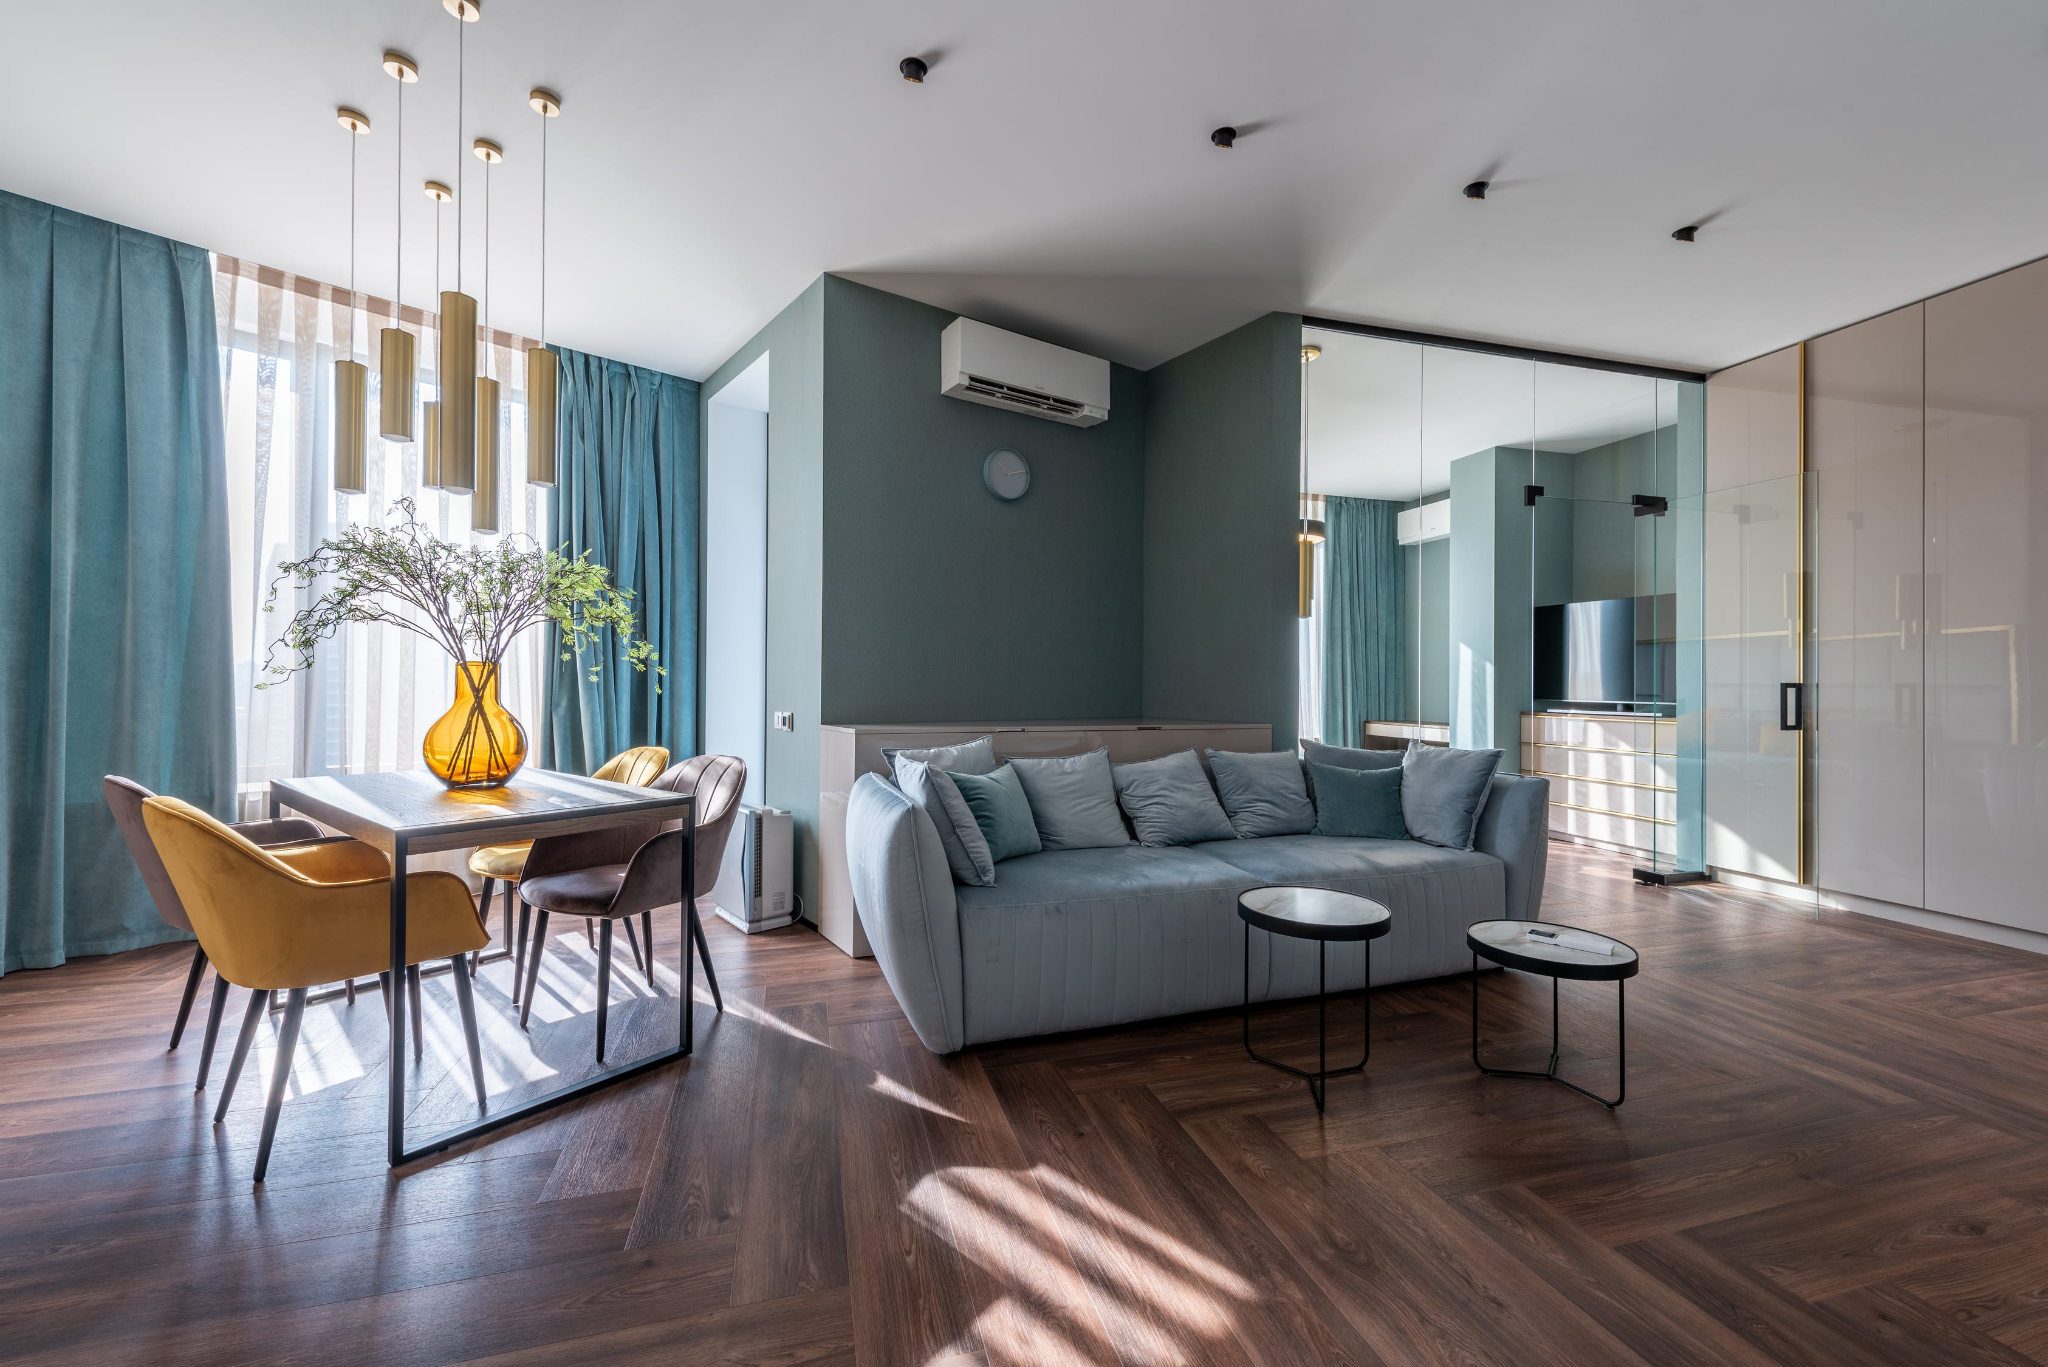 Predominantly light blue living room with dark brown parquet flooring